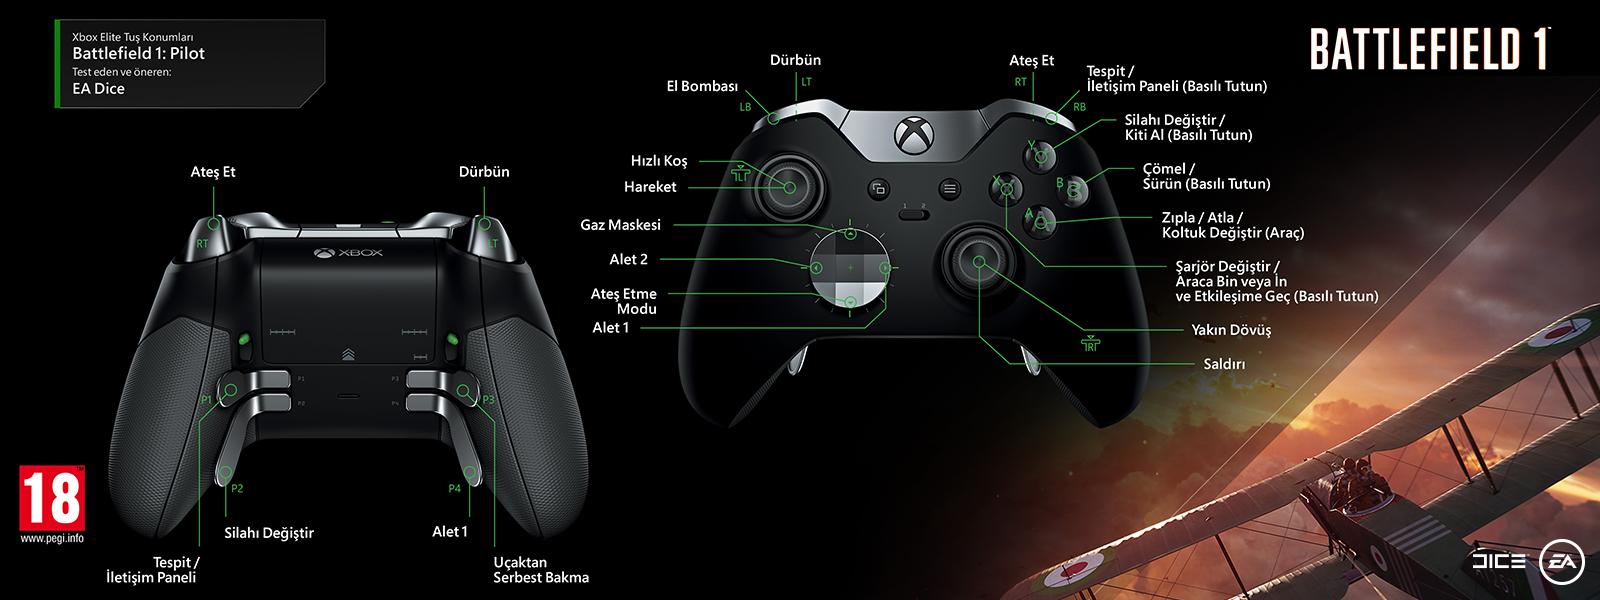 Battlefield 1 – Pilot Elite Kontrol Düzeni